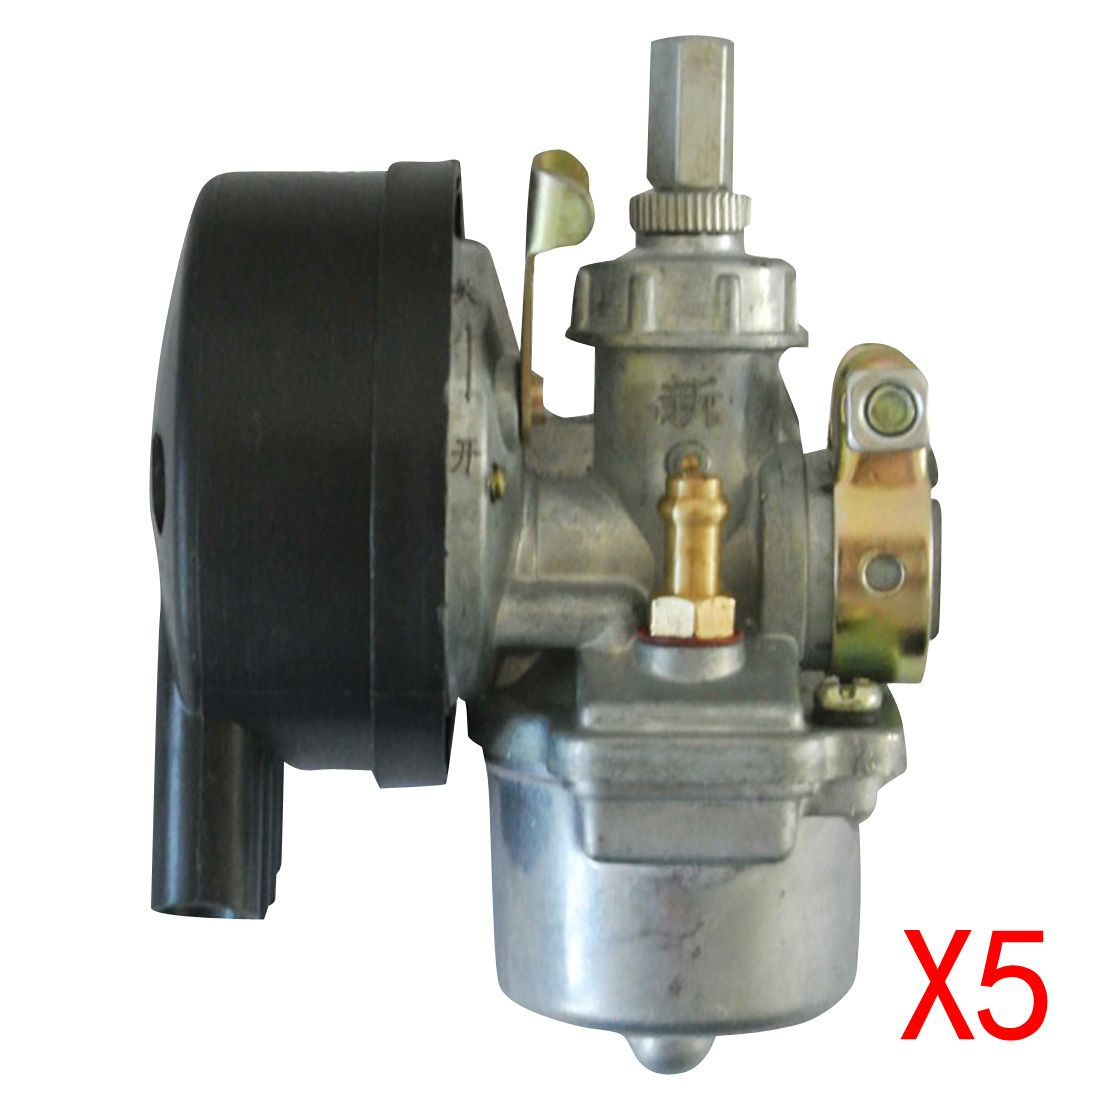 5* Black Carburetor For 49 60 66 80cc 2 Stroke Engine Motorized Bicycle Scooter